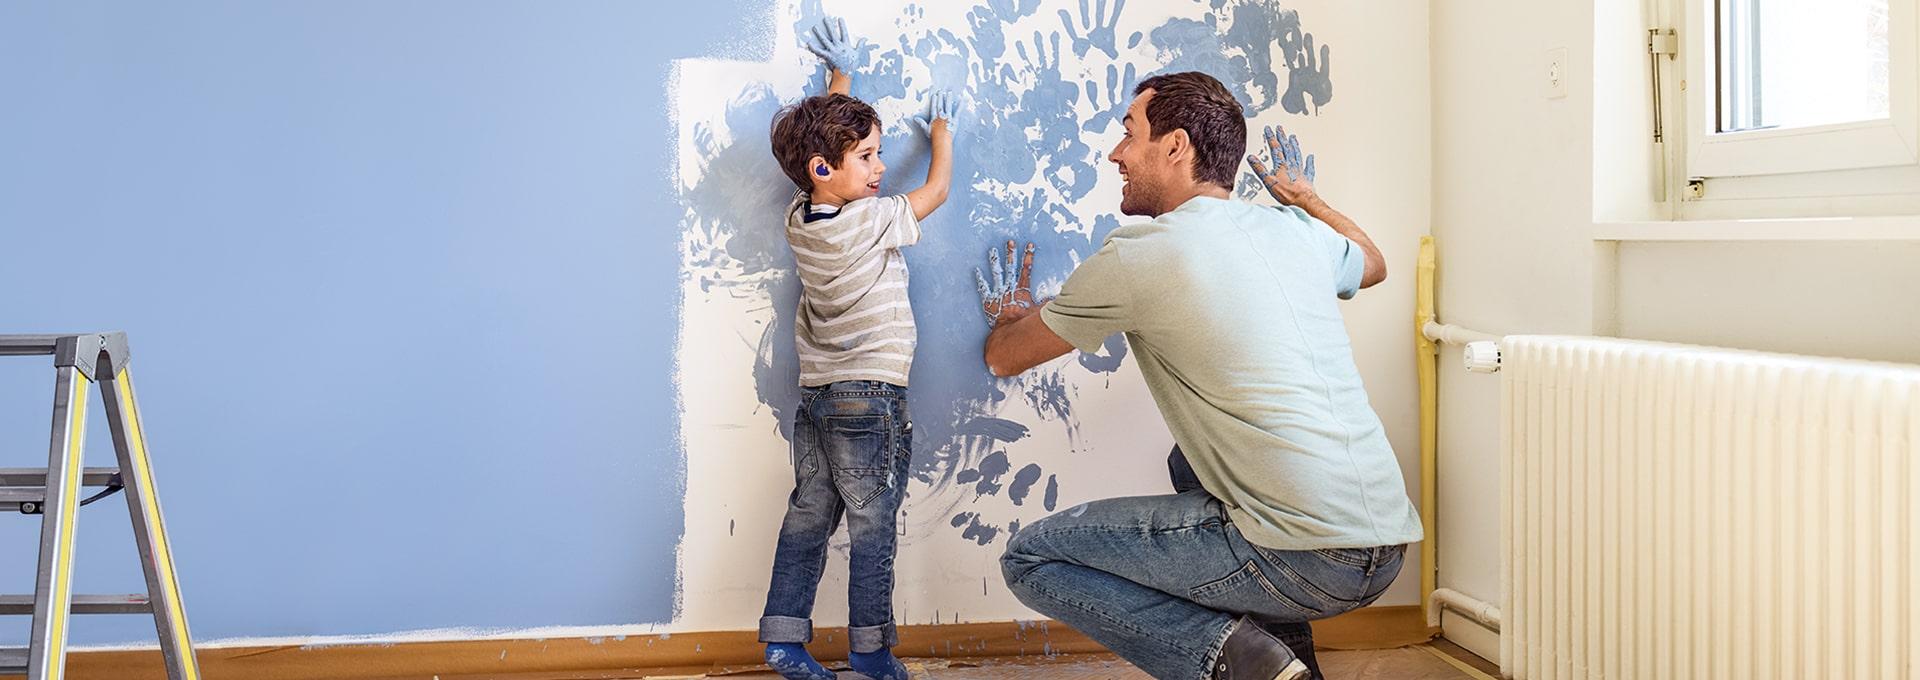 Отец и сын со слуховыми аппаратами  Bernafon Leox Super Power|Ultra Power красят стену и спонтанно оставляют отпечатки рук на стене.